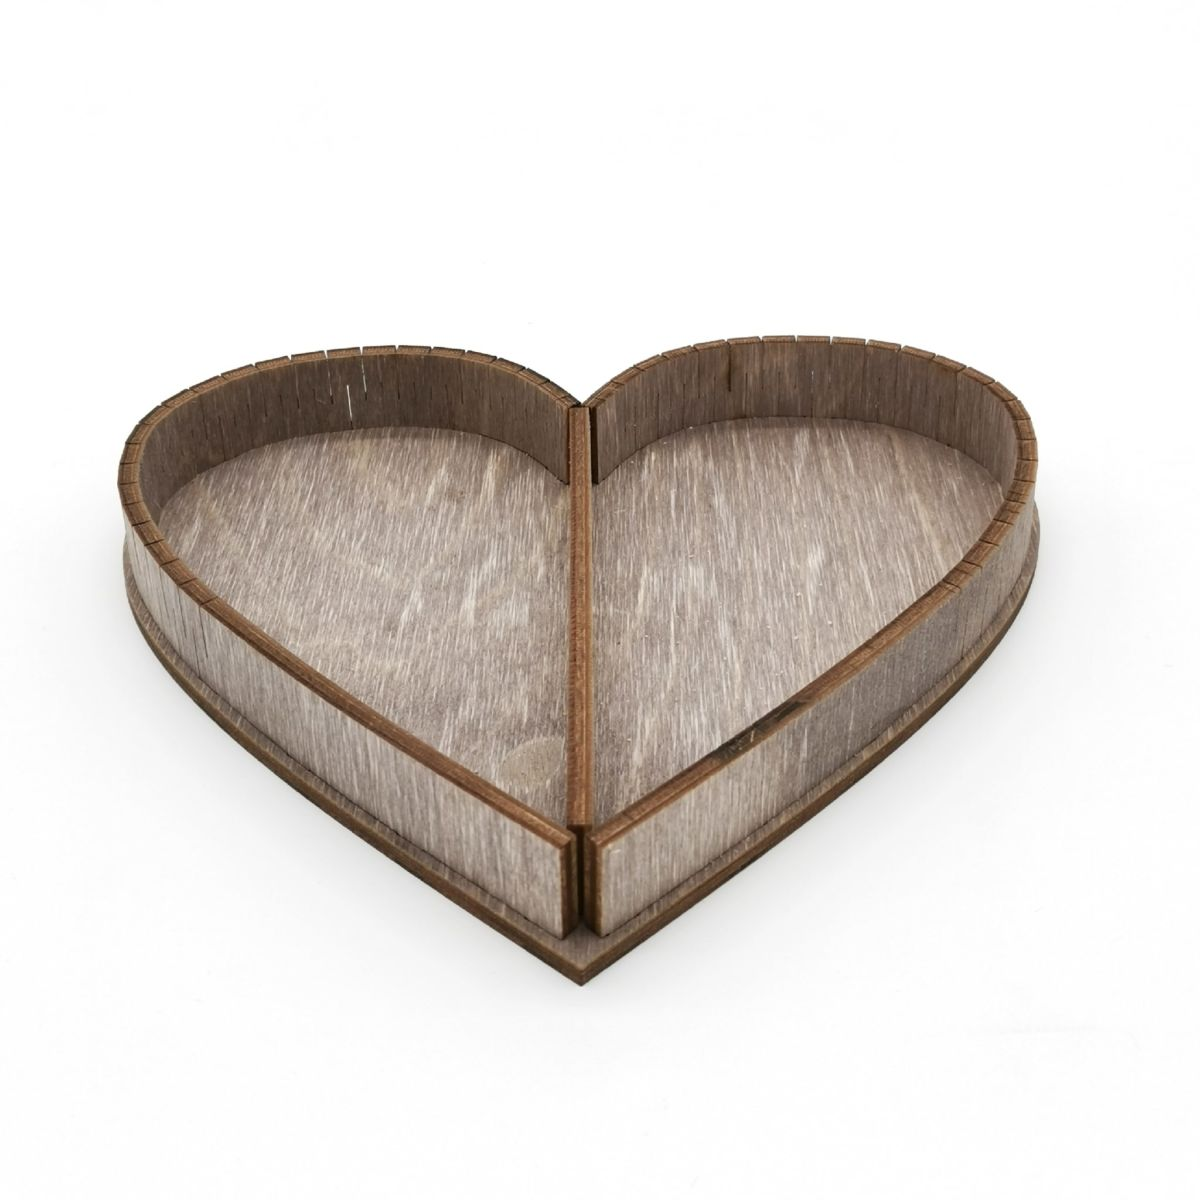 Laser Cut Heart Shaped Wood Tray Free Vector